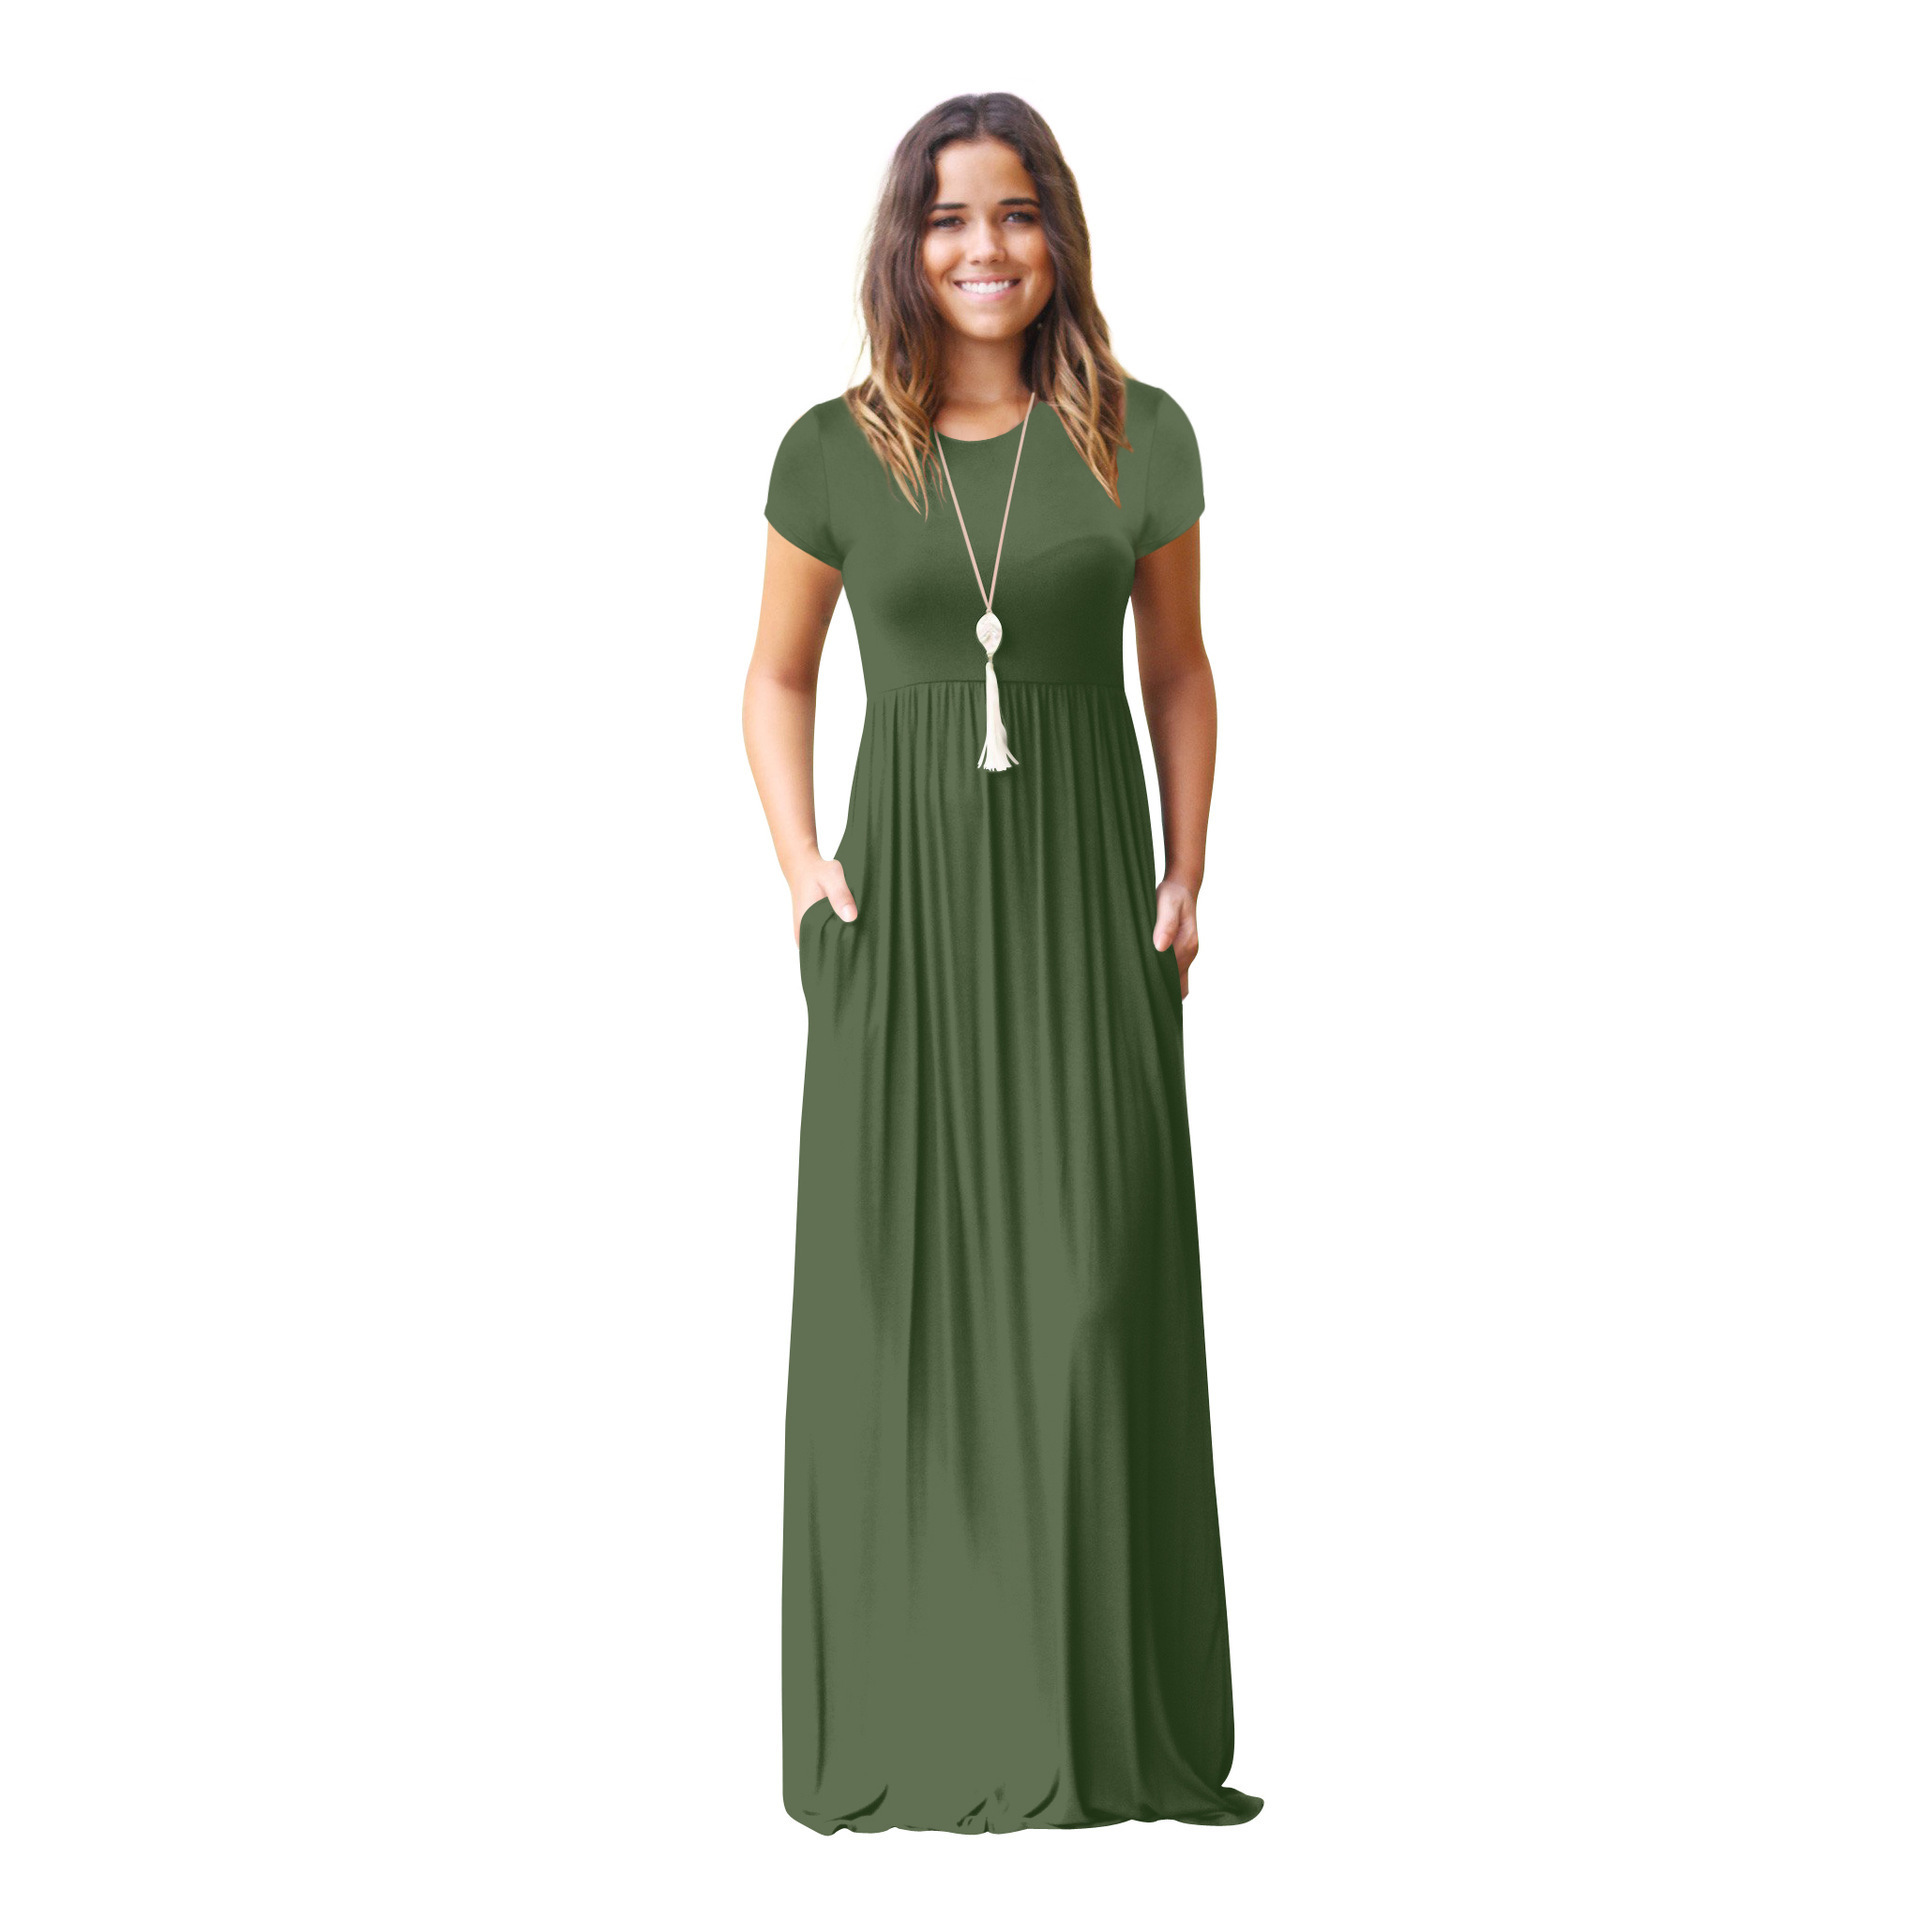 a9110d6024490 Dropship Long Summer Dress Vestidos De Verano 2018 Longue Women Maxi  Dresses Clothes Modis Cotton Vetement Femme Autumn